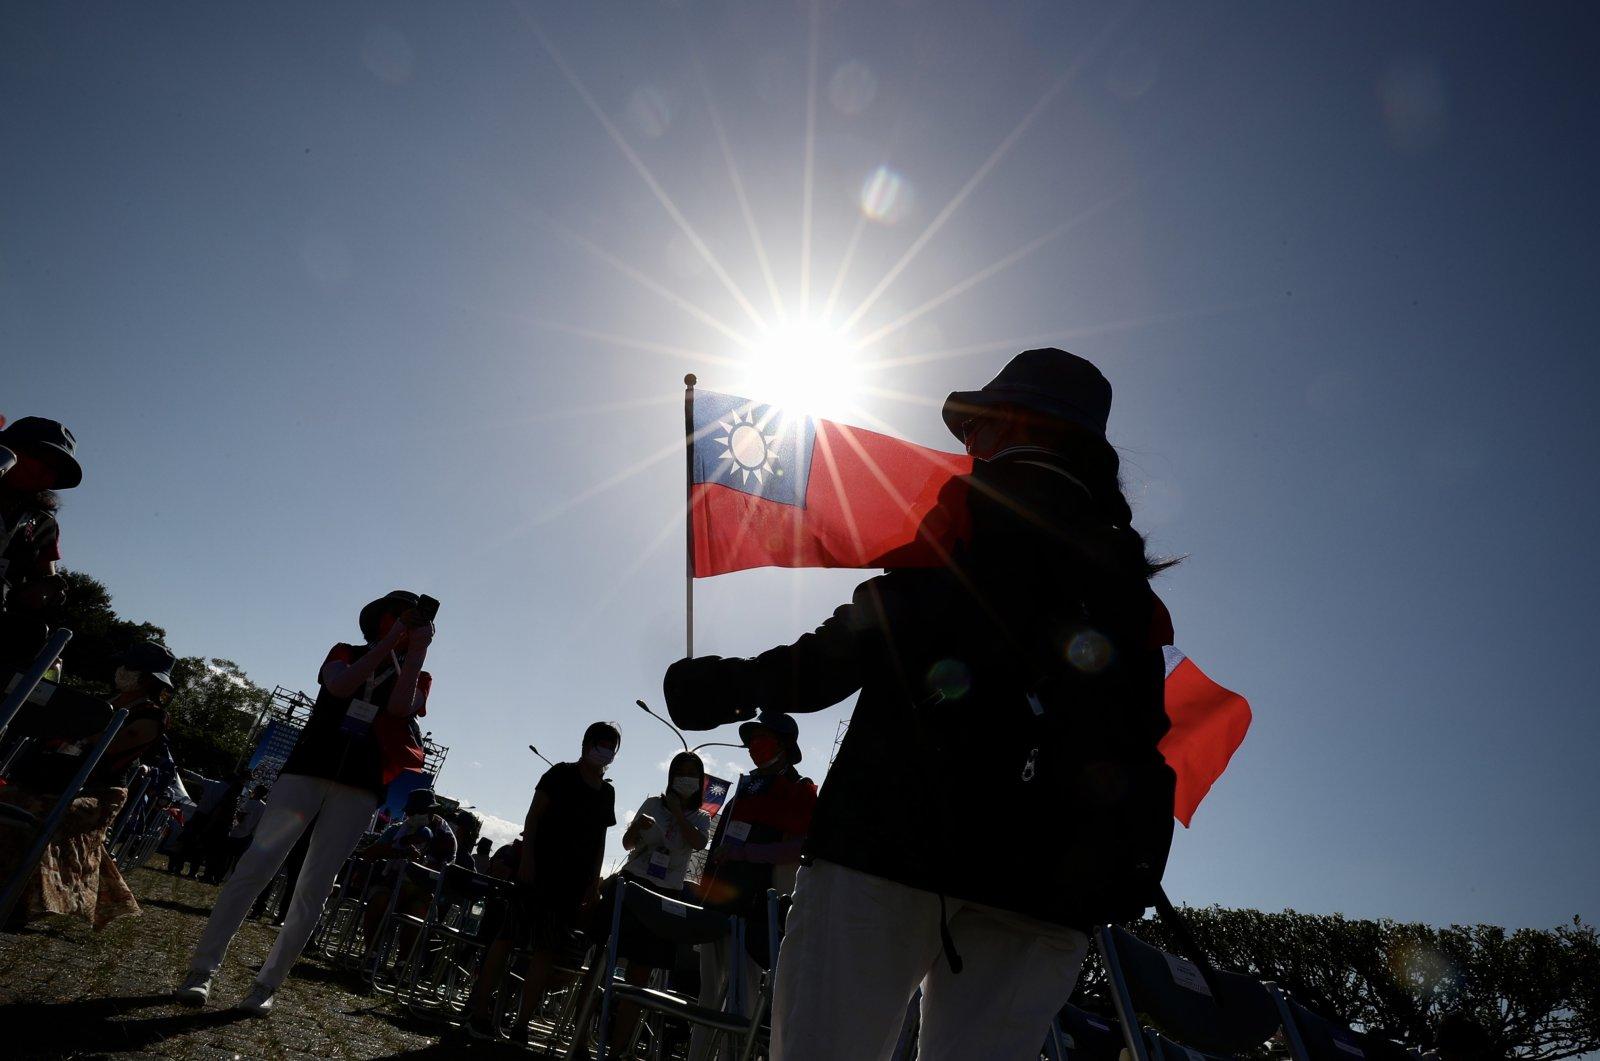 Taiwanese people attend National Day celebrations in Taipei, Taiwan, Oct. 10, 2021. (EPA Photo)